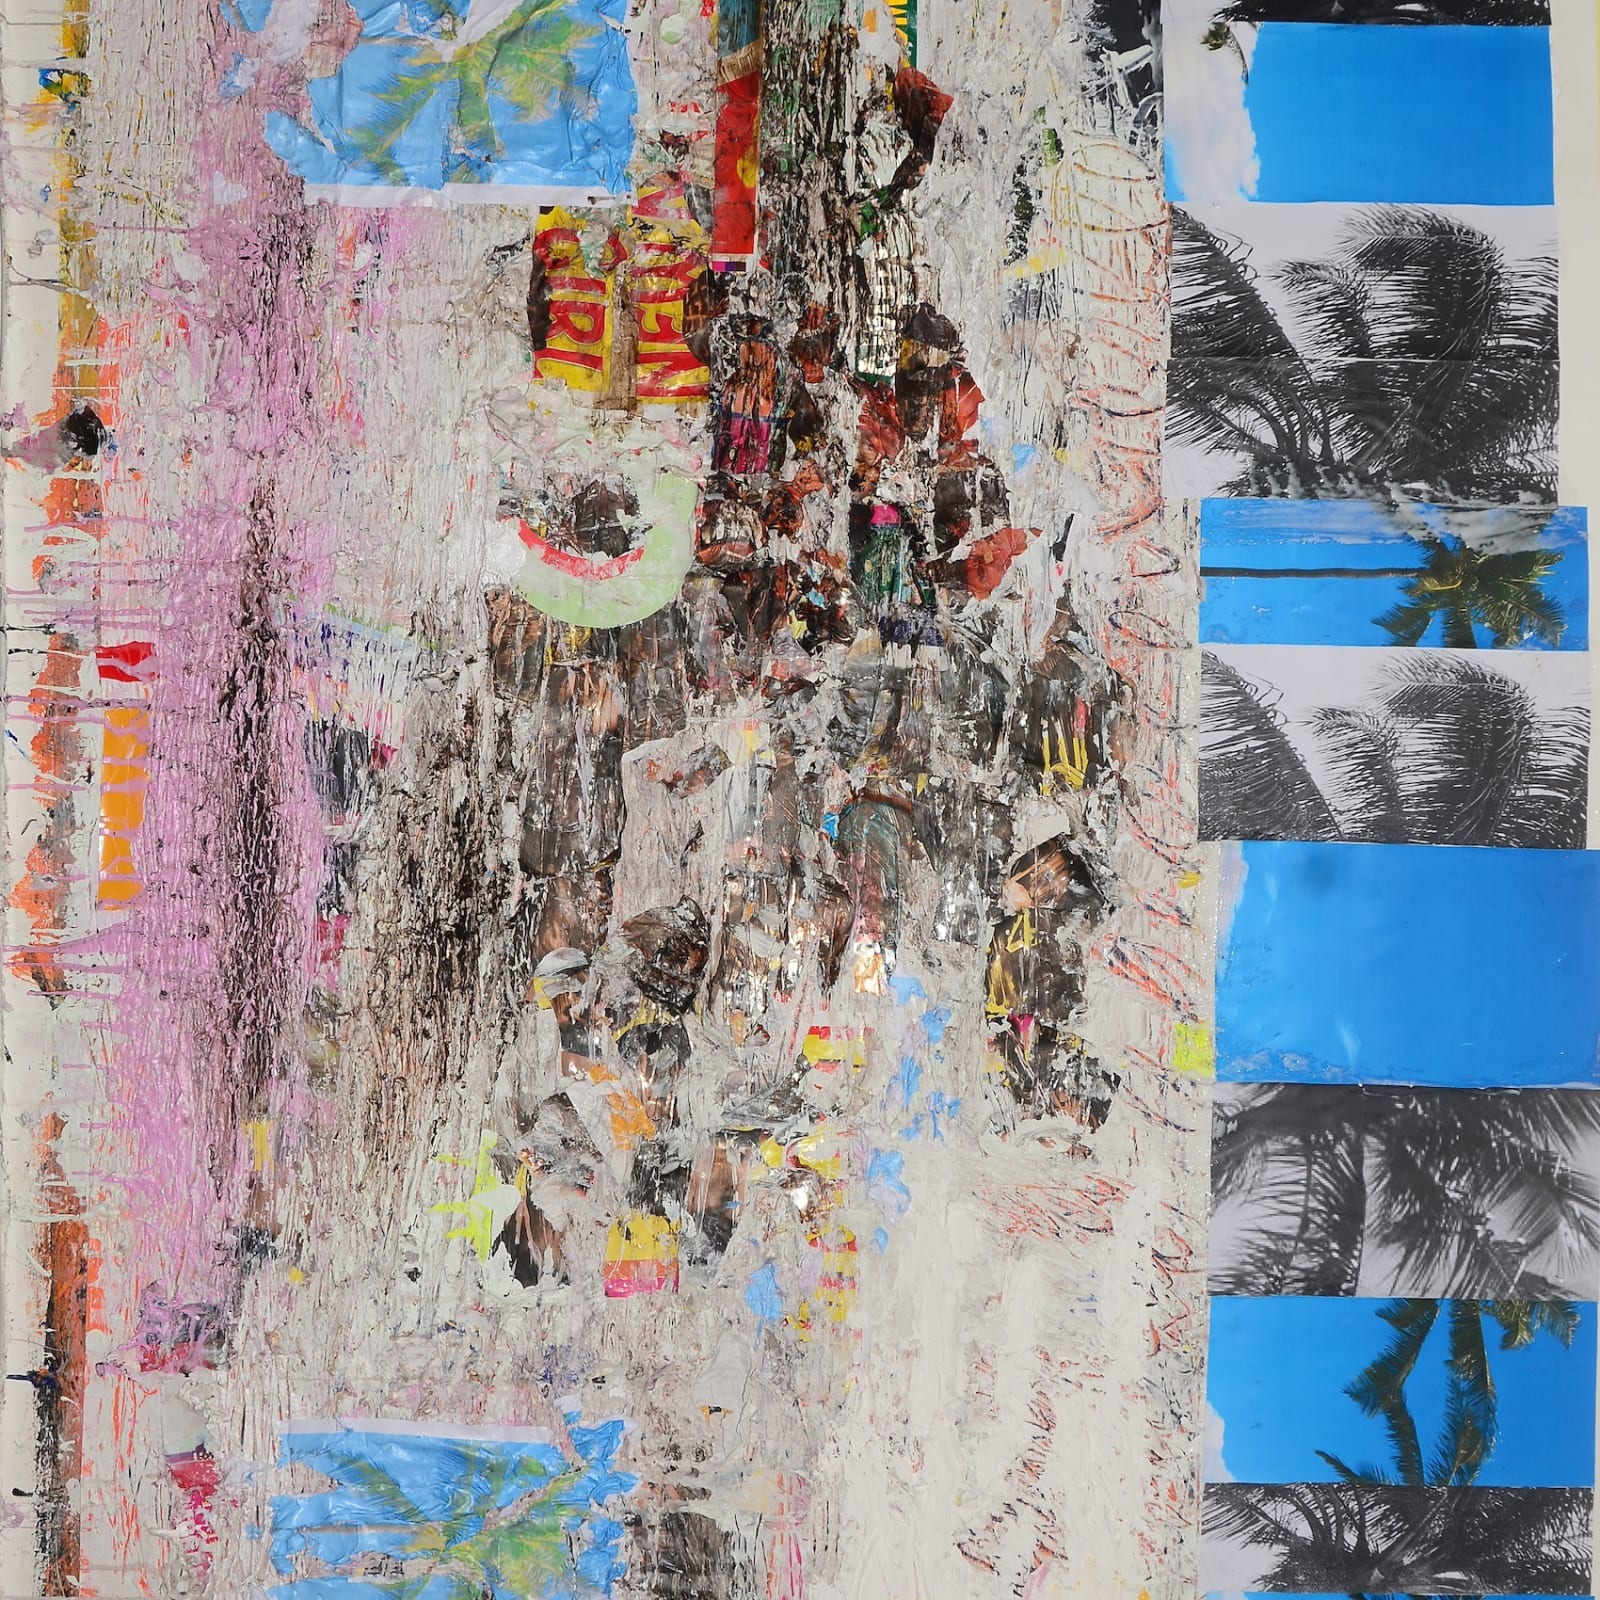 Gideon Appah, Untitled, 2017